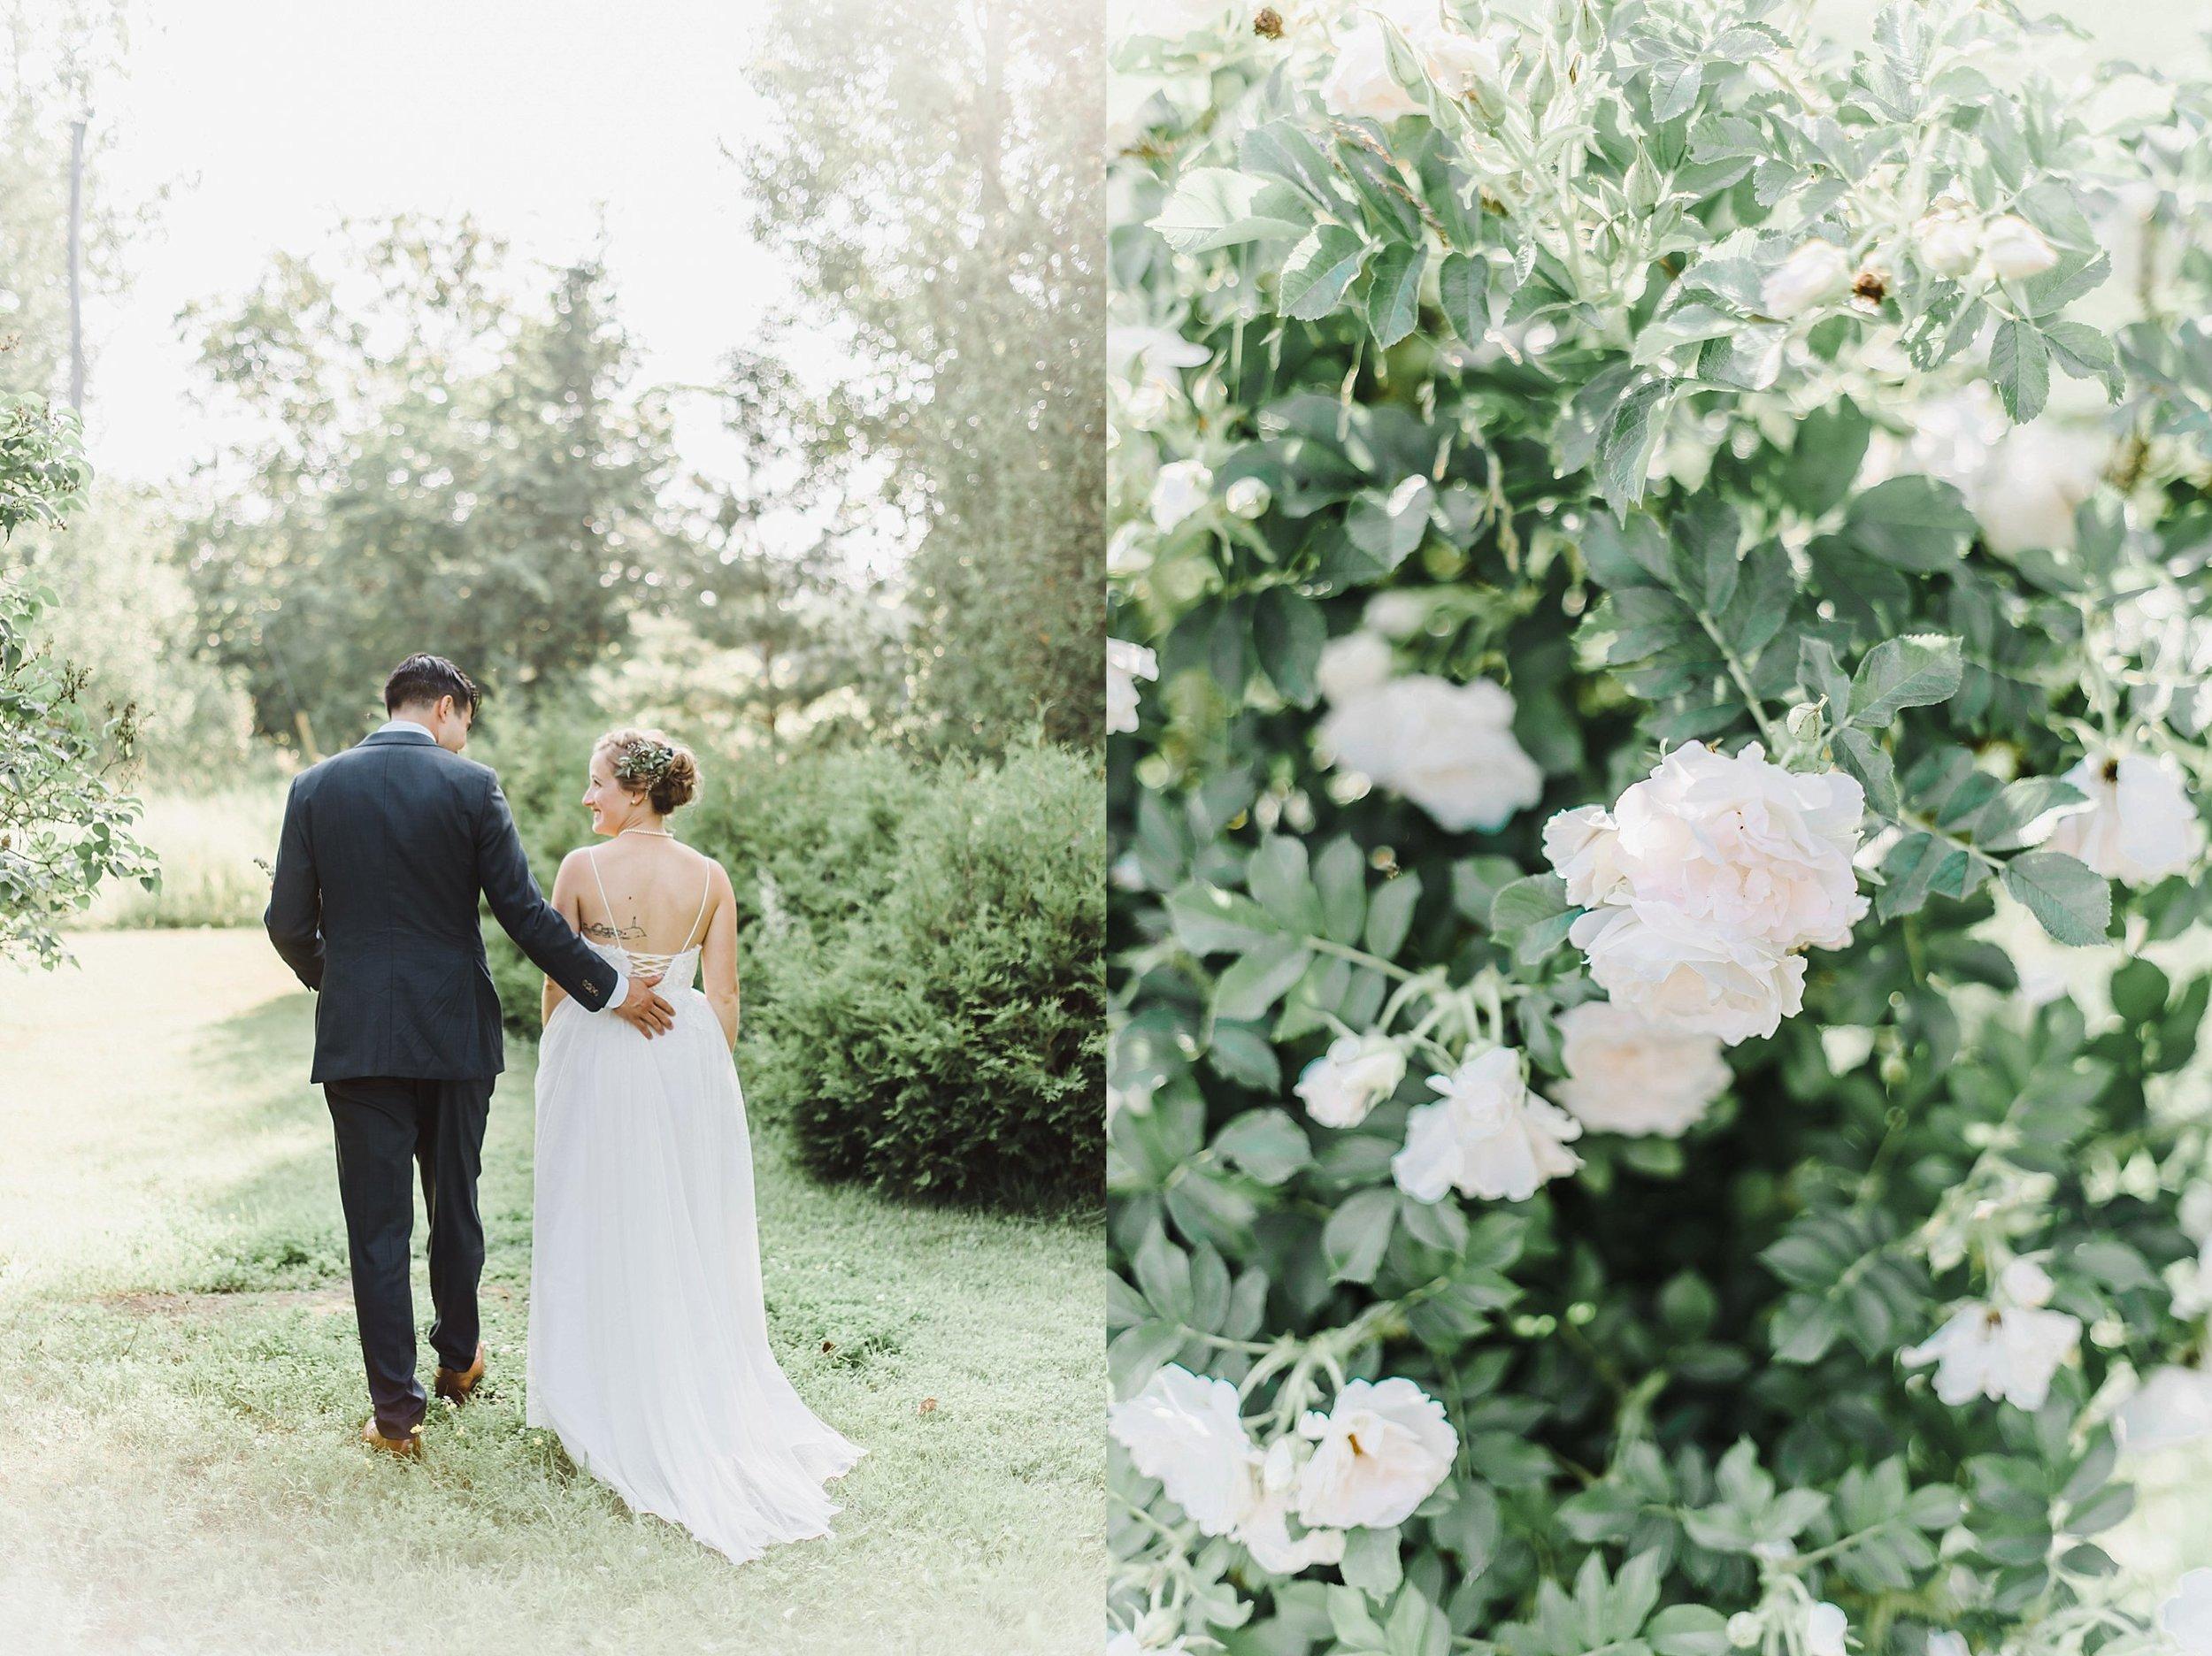 light airy indie fine art ottawa wedding photographer | Ali and Batoul Photography_0860.jpg